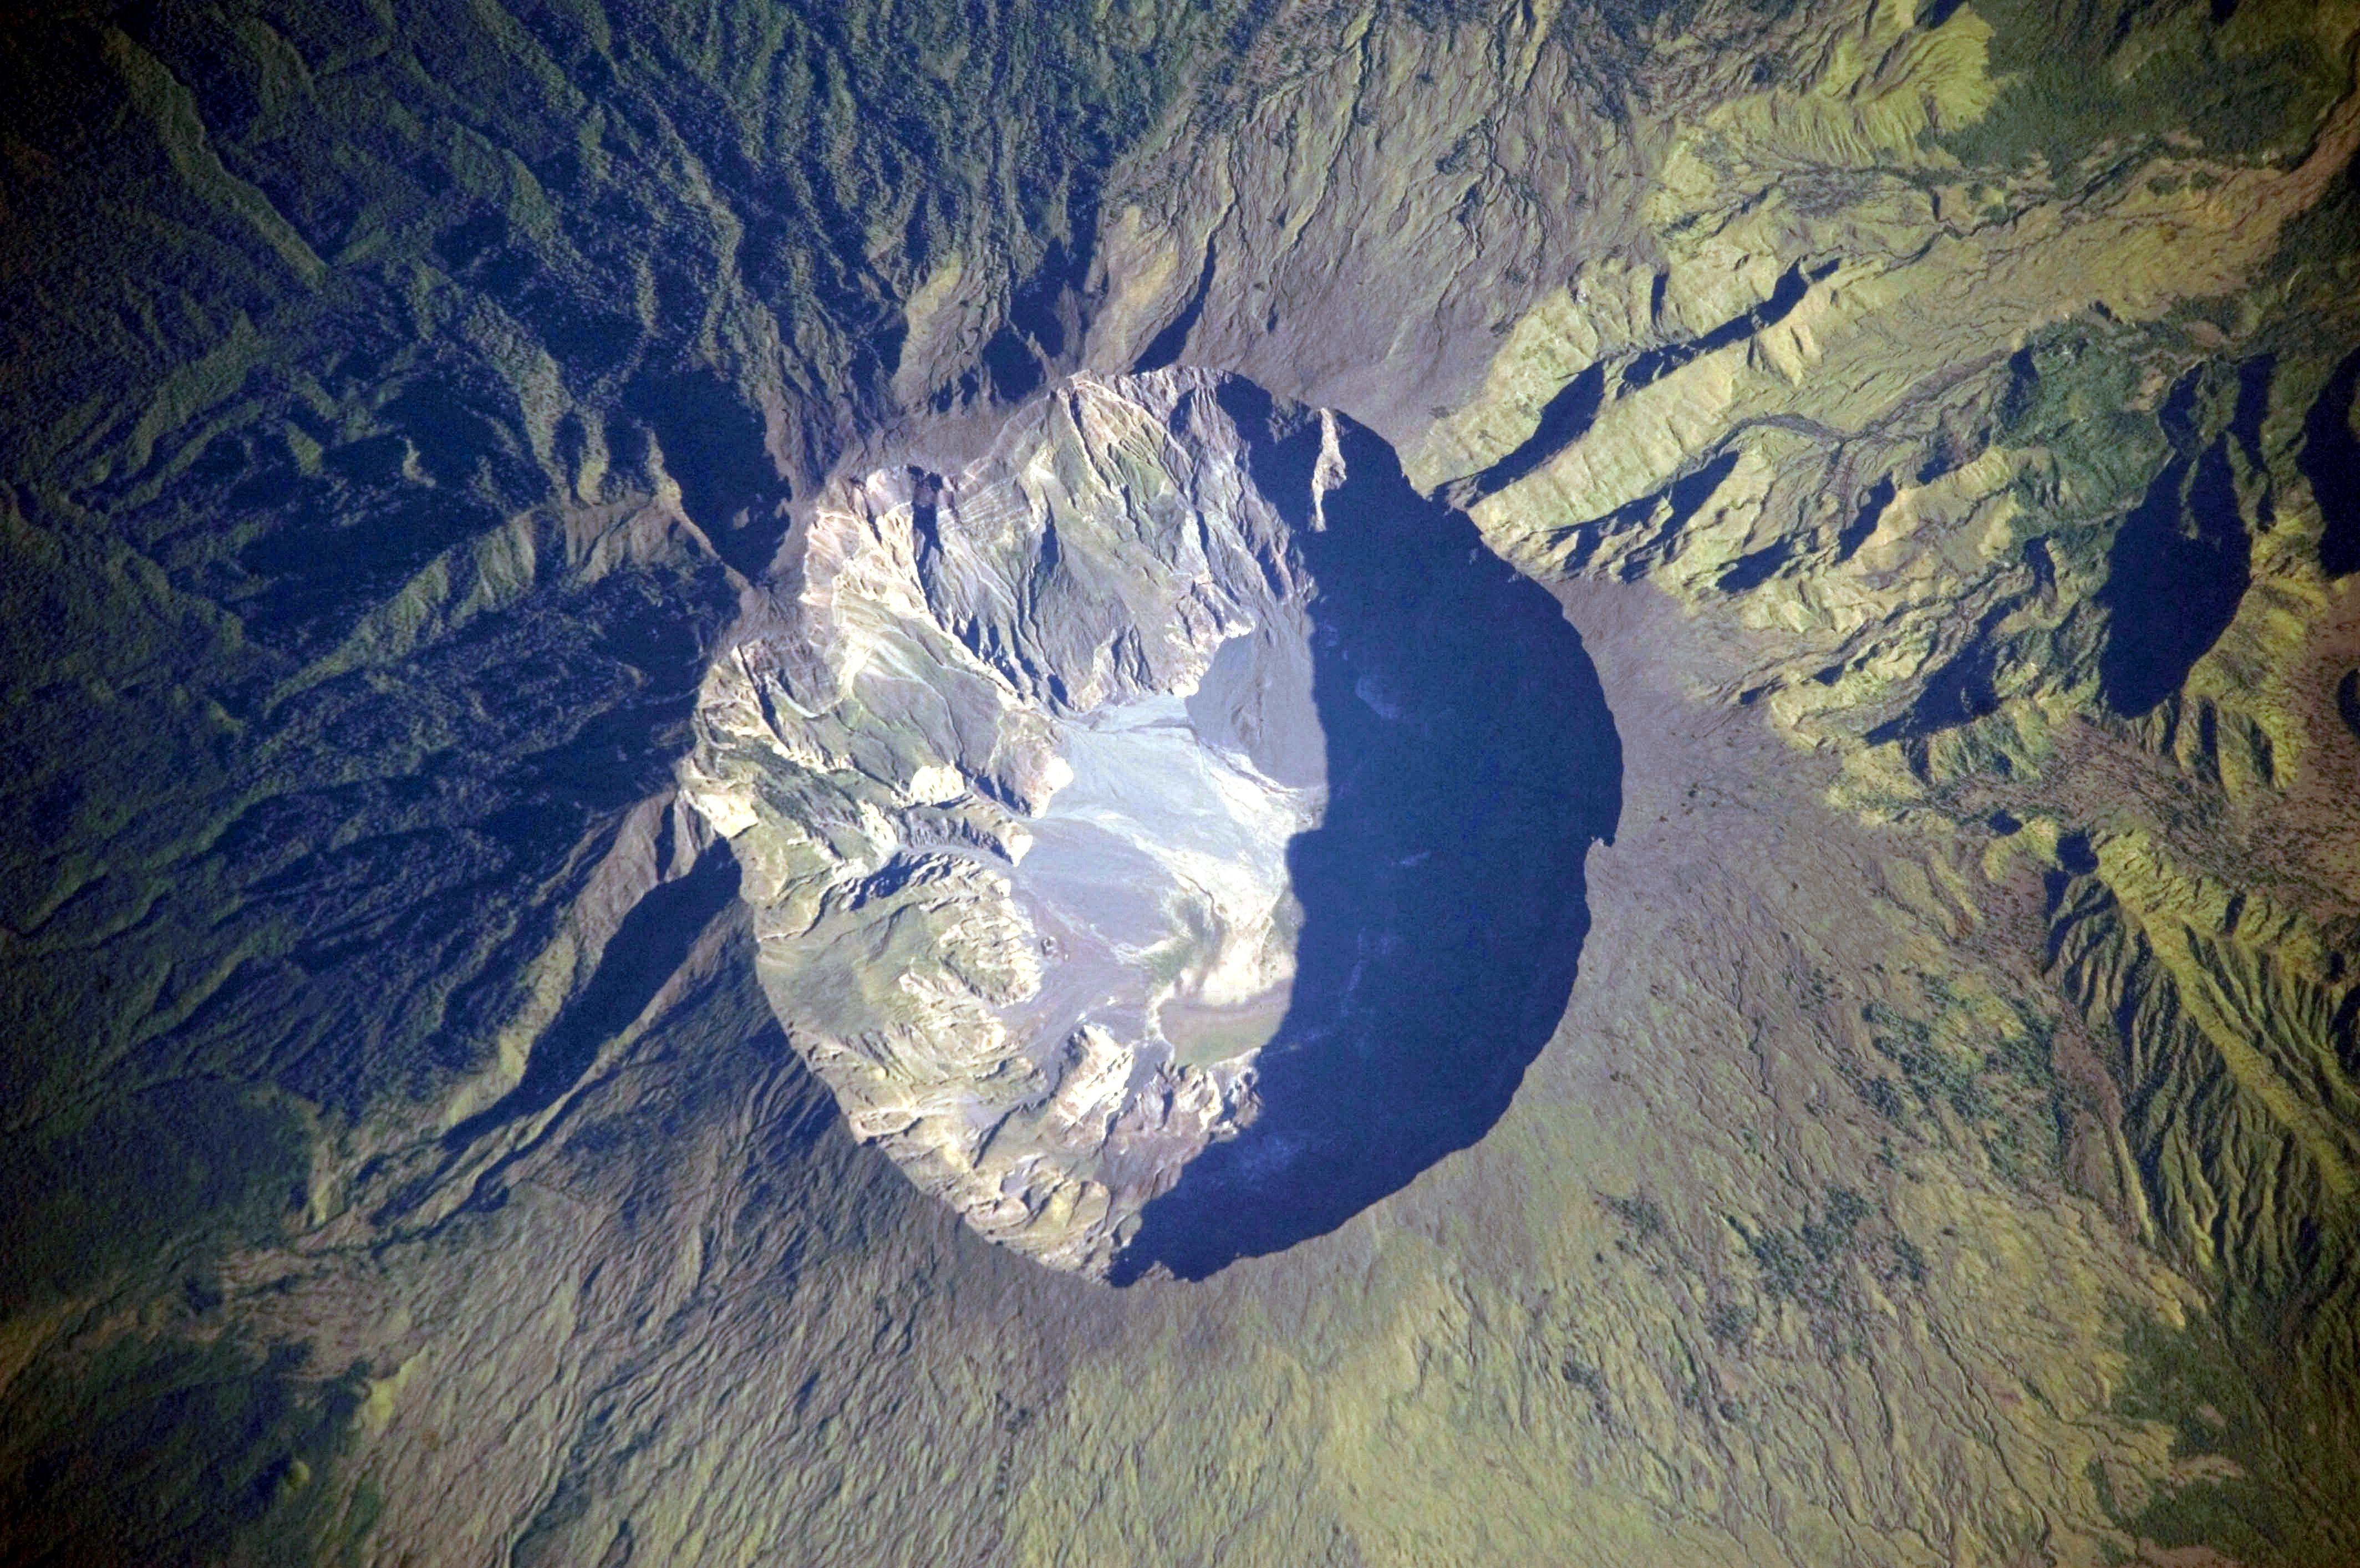 Mount Tambora Wikipedia Bike Tool 15 In 1 With Chain Cutter United Hijau